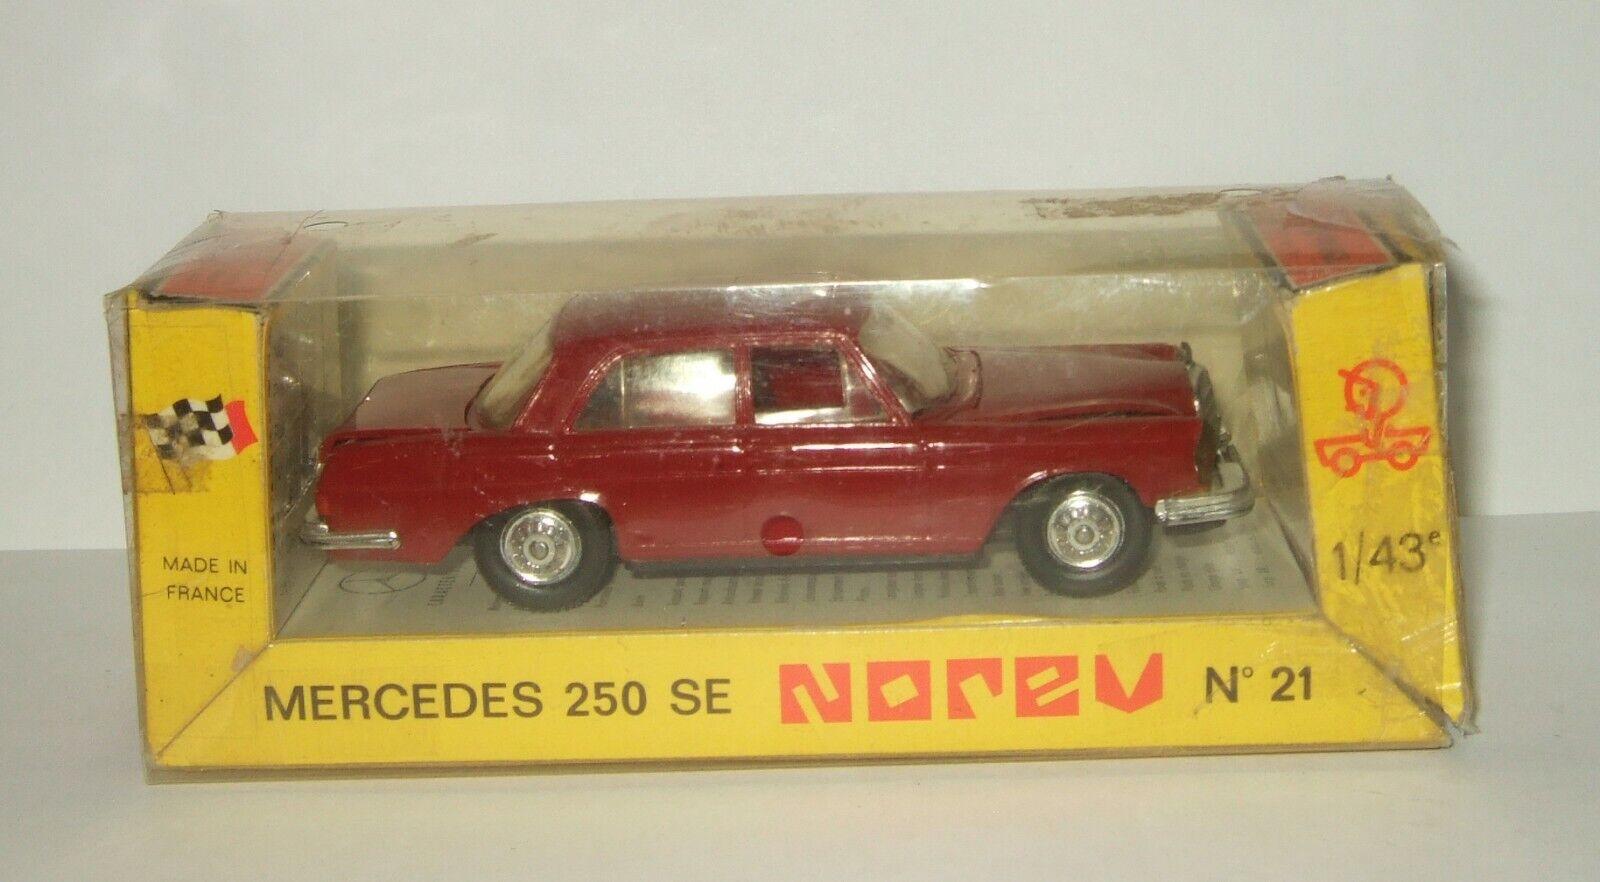 Venta 1 43 Norev Mercedes Benz 250 se W111 W112 1966 Hecho En Francia Raro